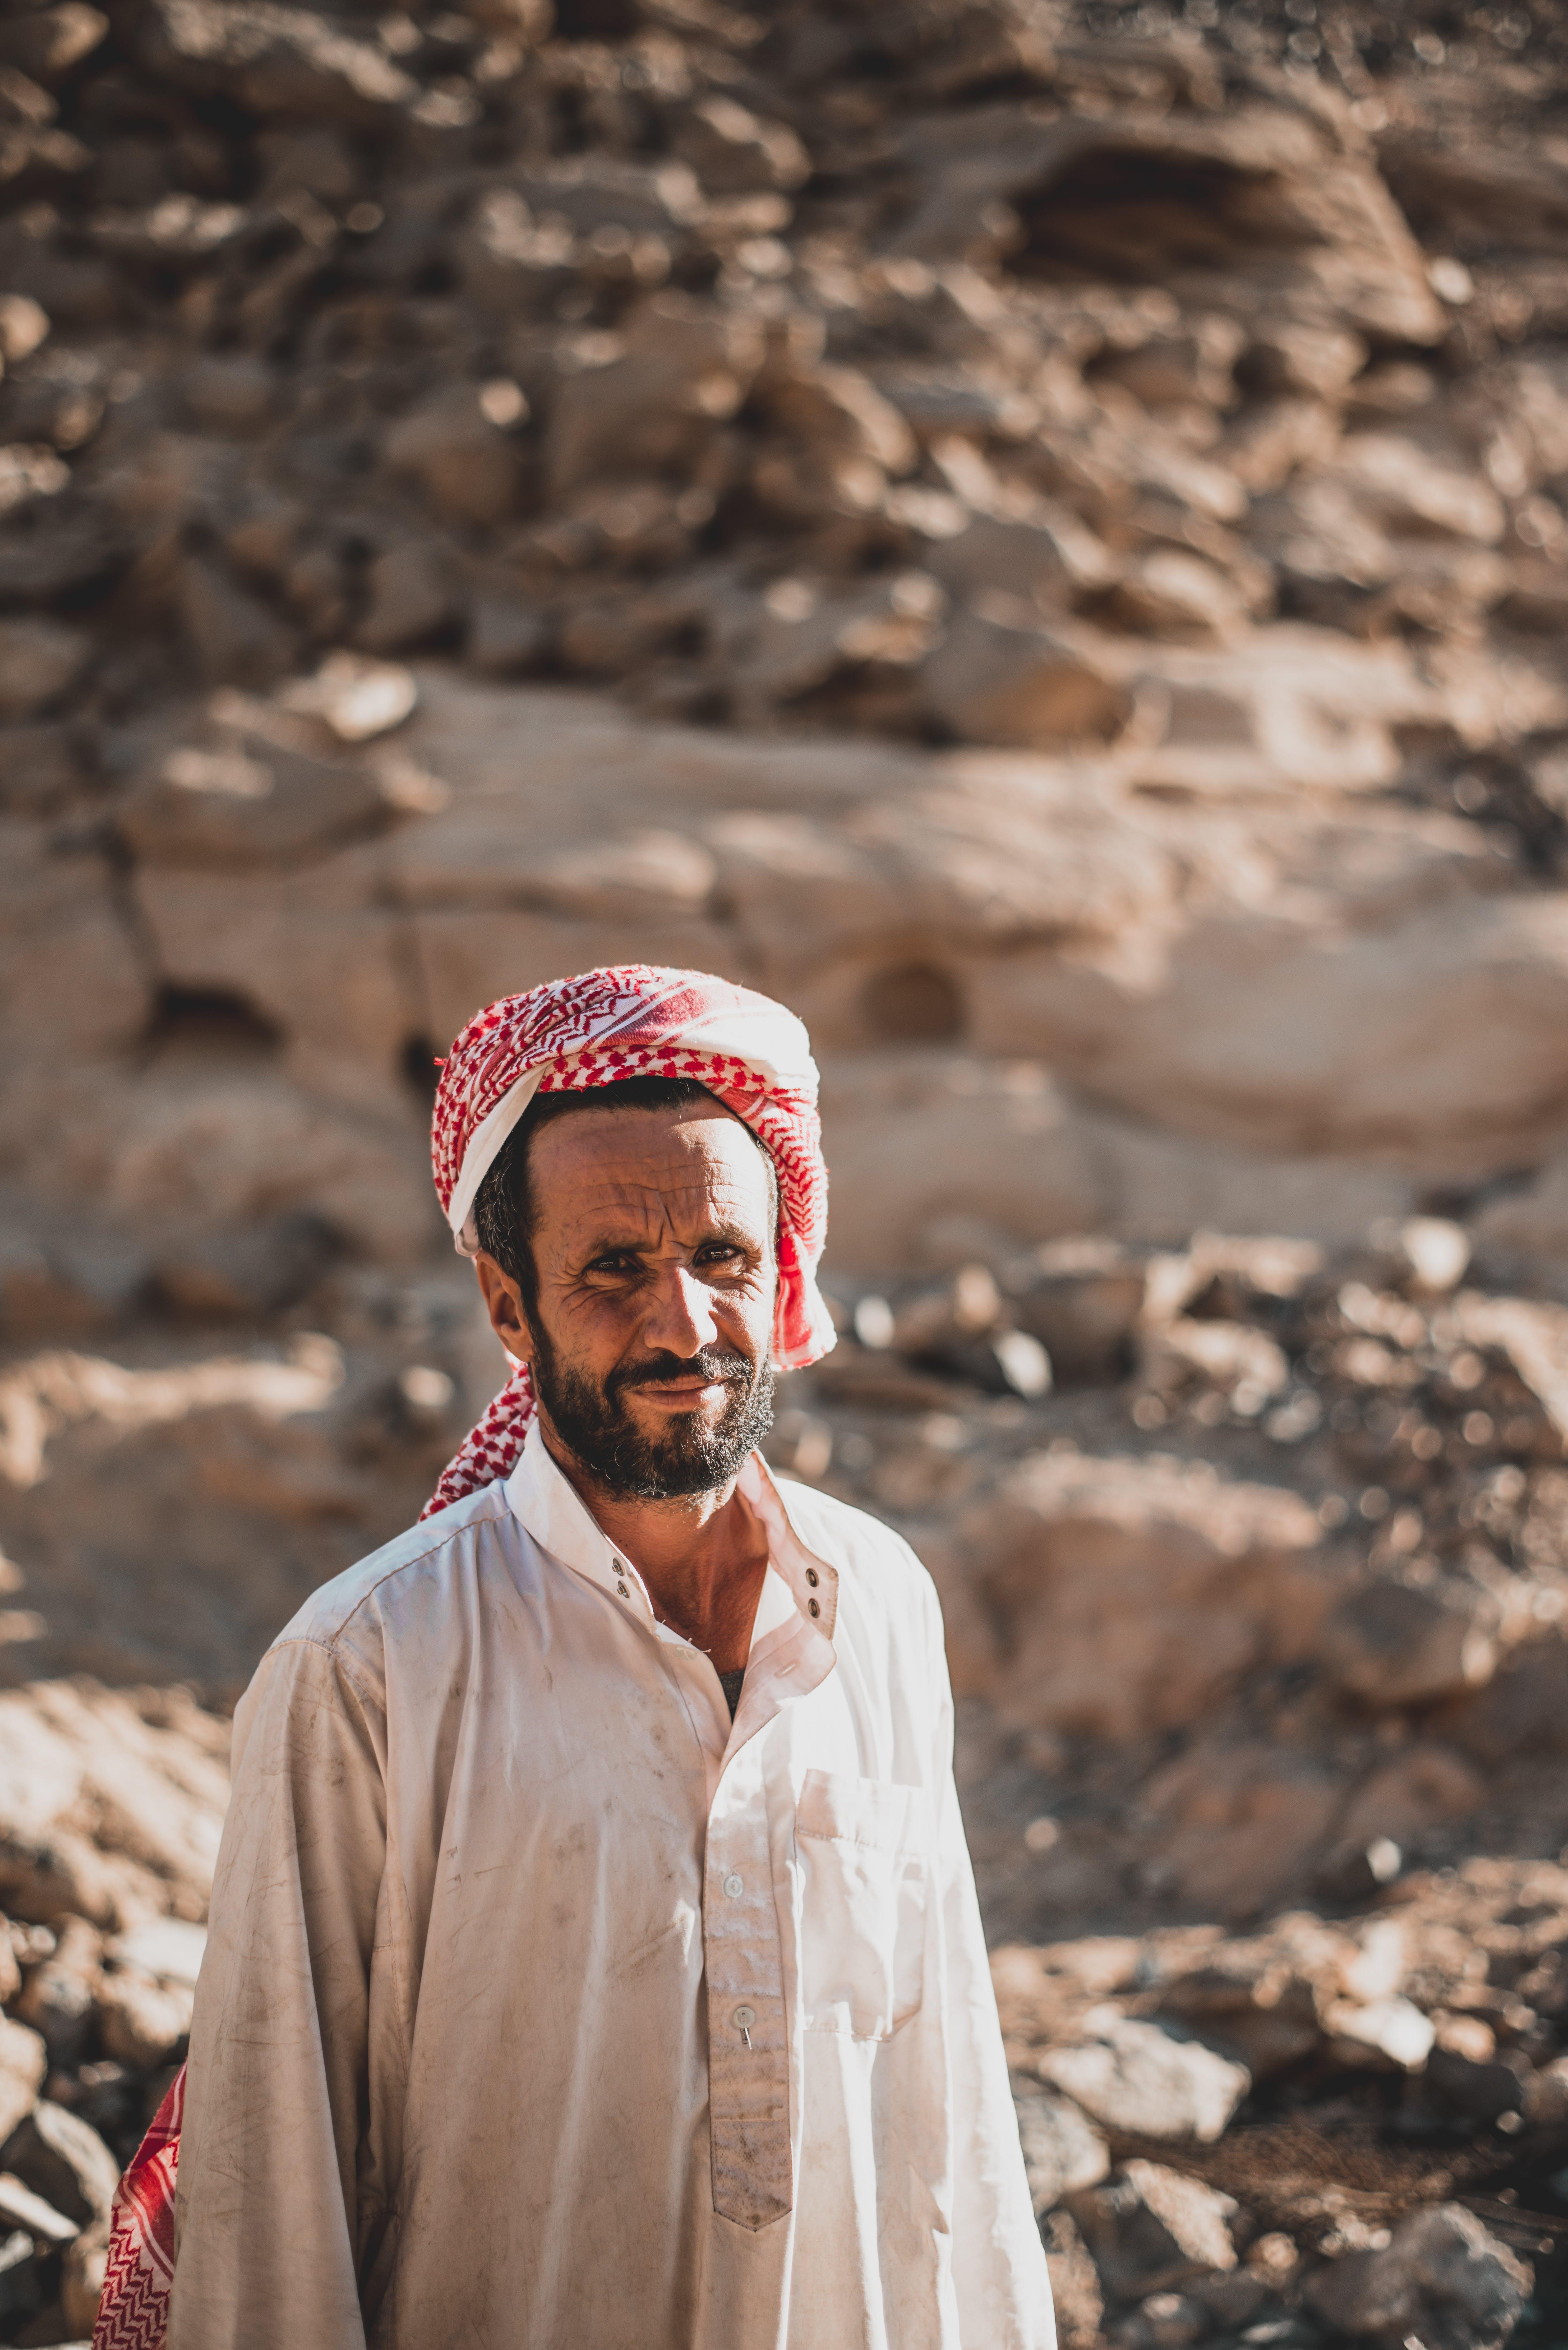 Shallow Focus Photo of Man Wearing Kefiyeh Headdress